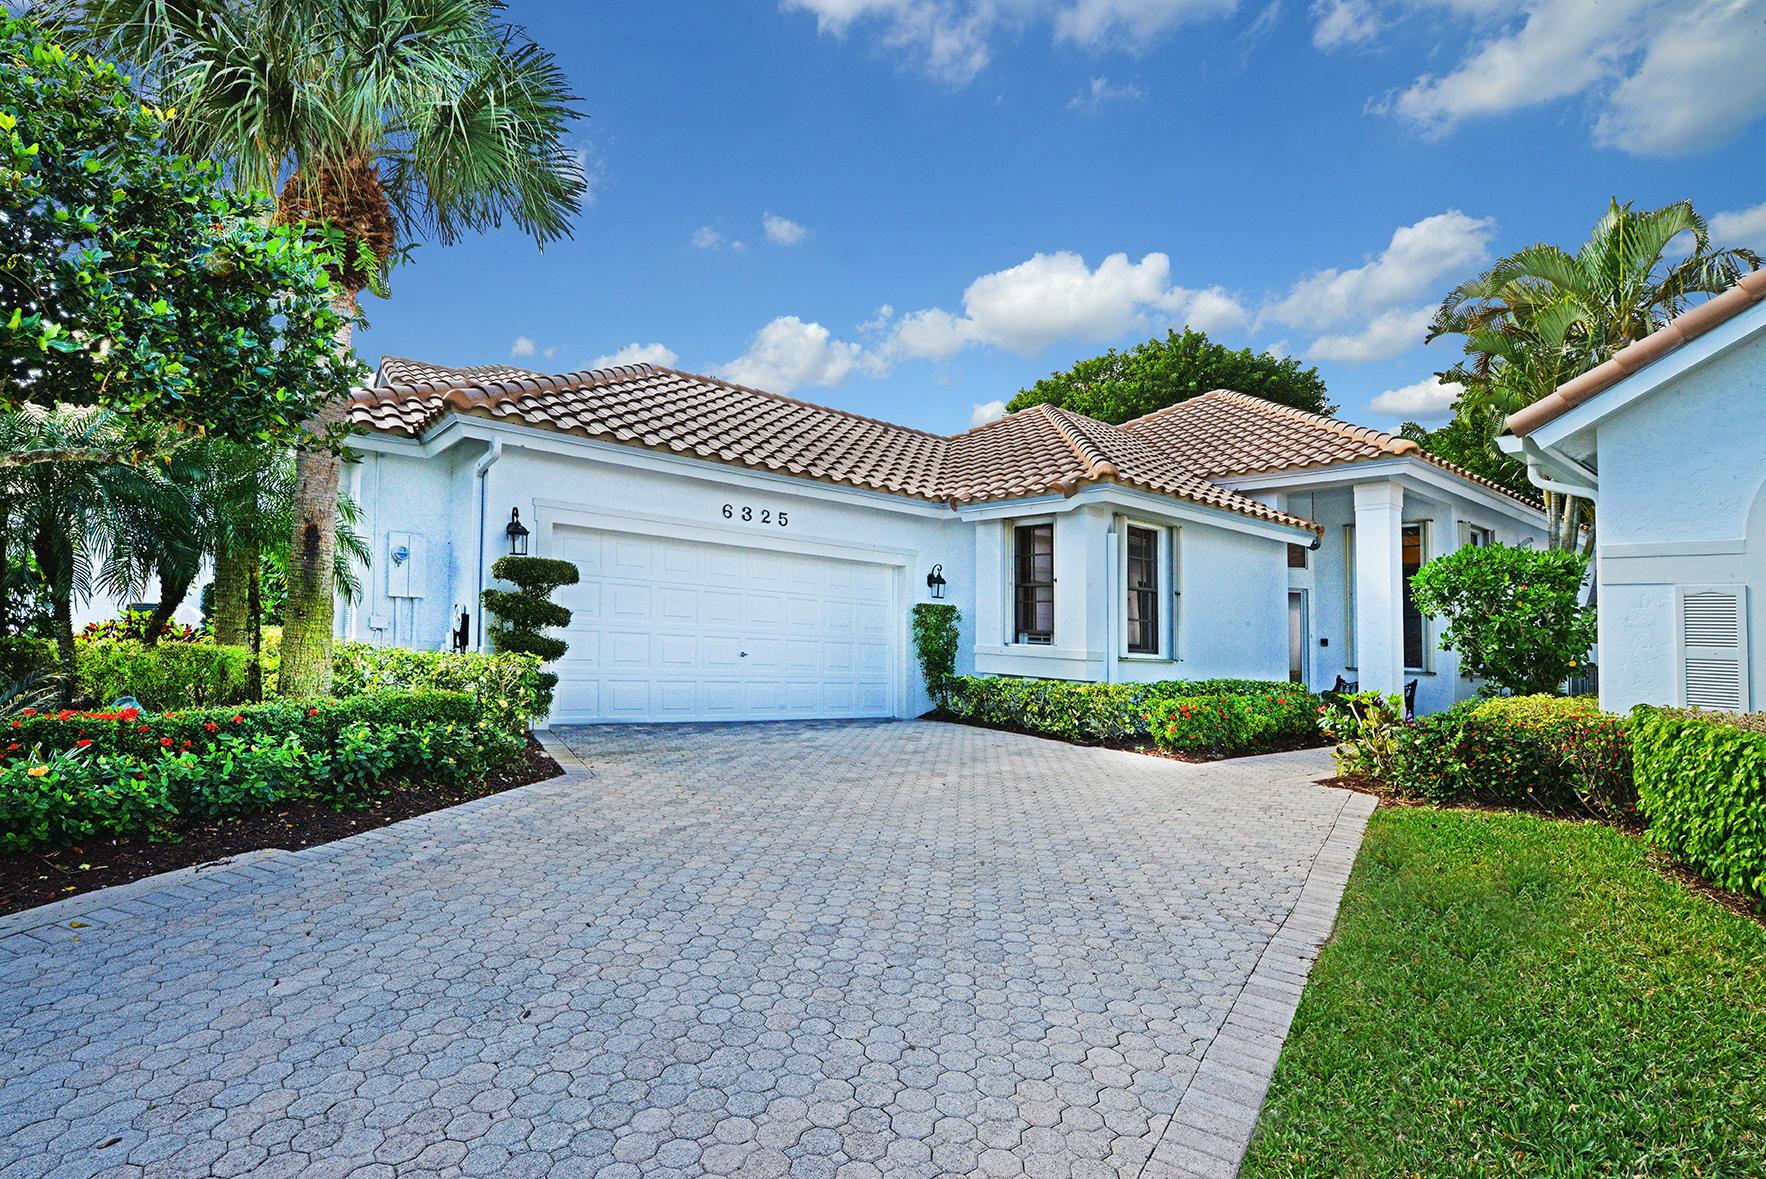 6325 Nw 25th Way Boca Raton, FL 33496